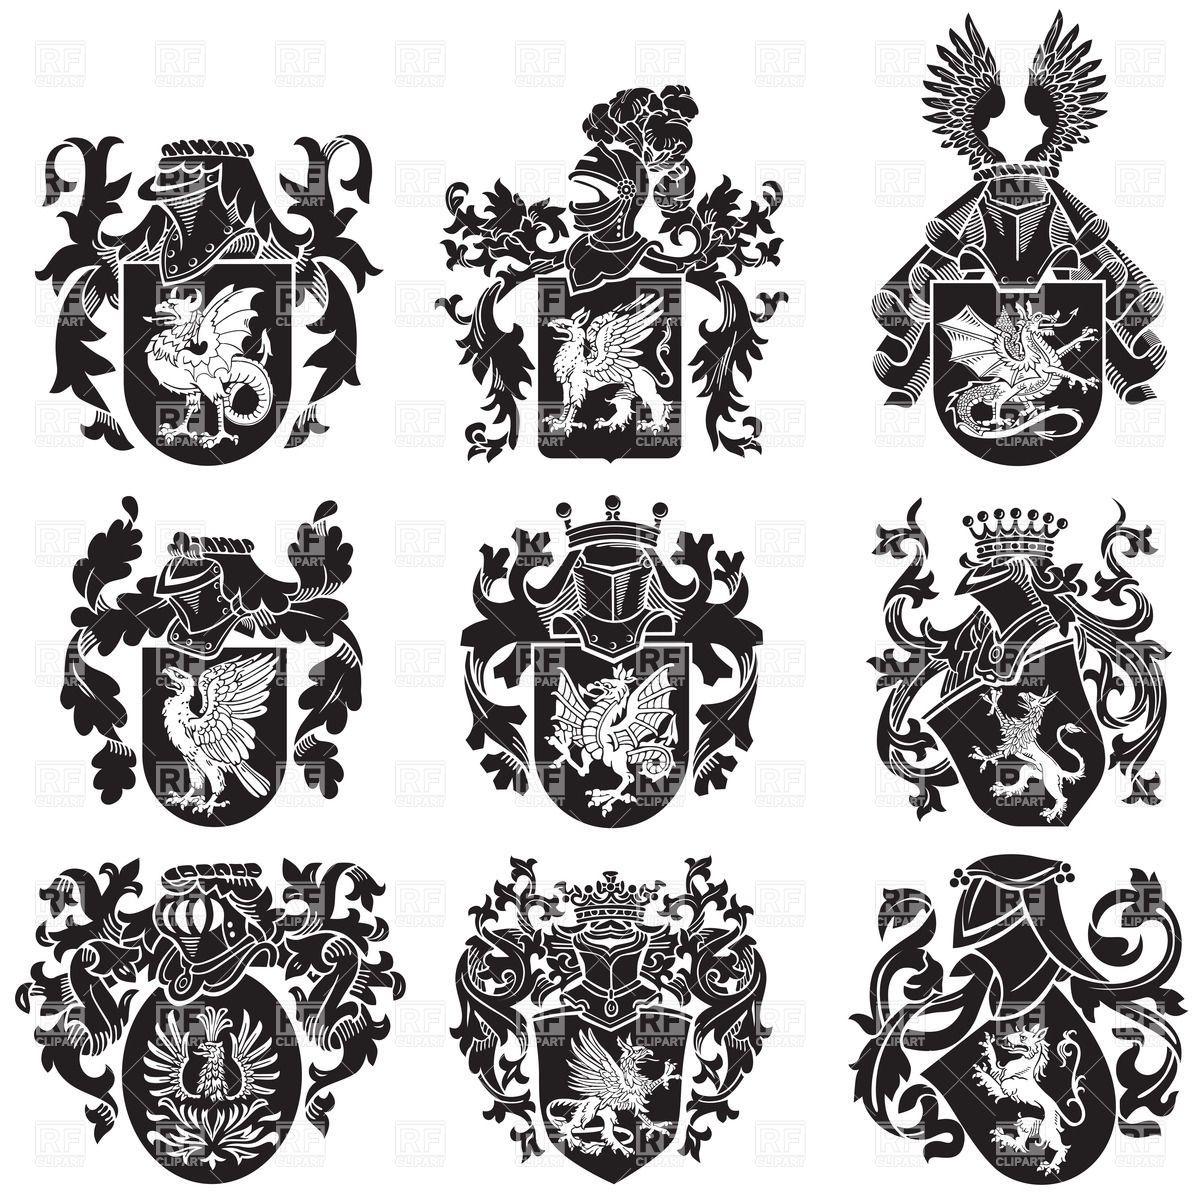 pics for gt medieval heraldry symbols family crest